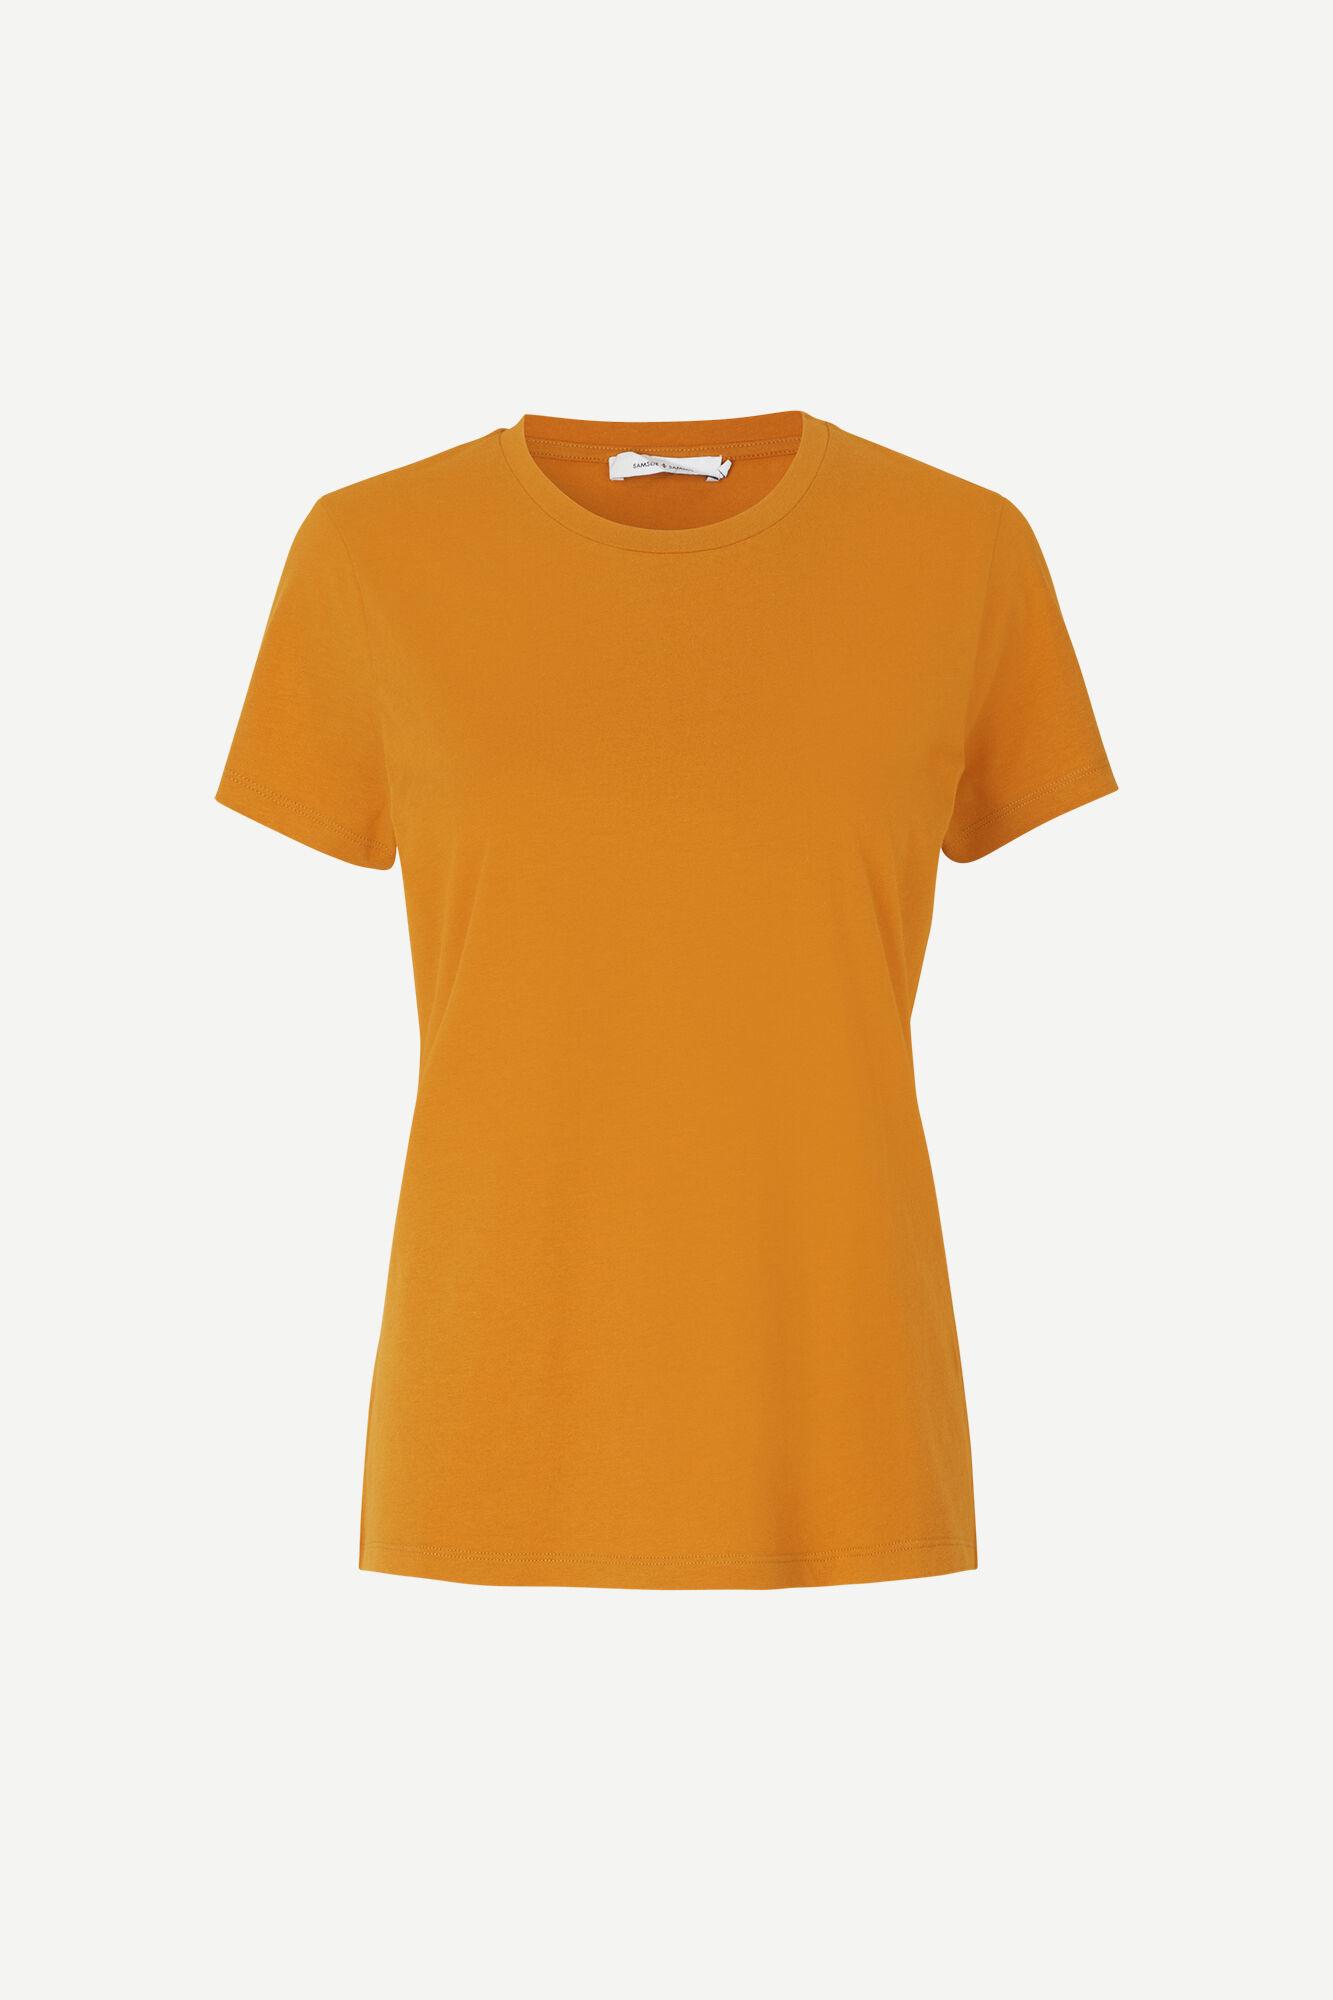 SAMSOE t-shirt solly-4